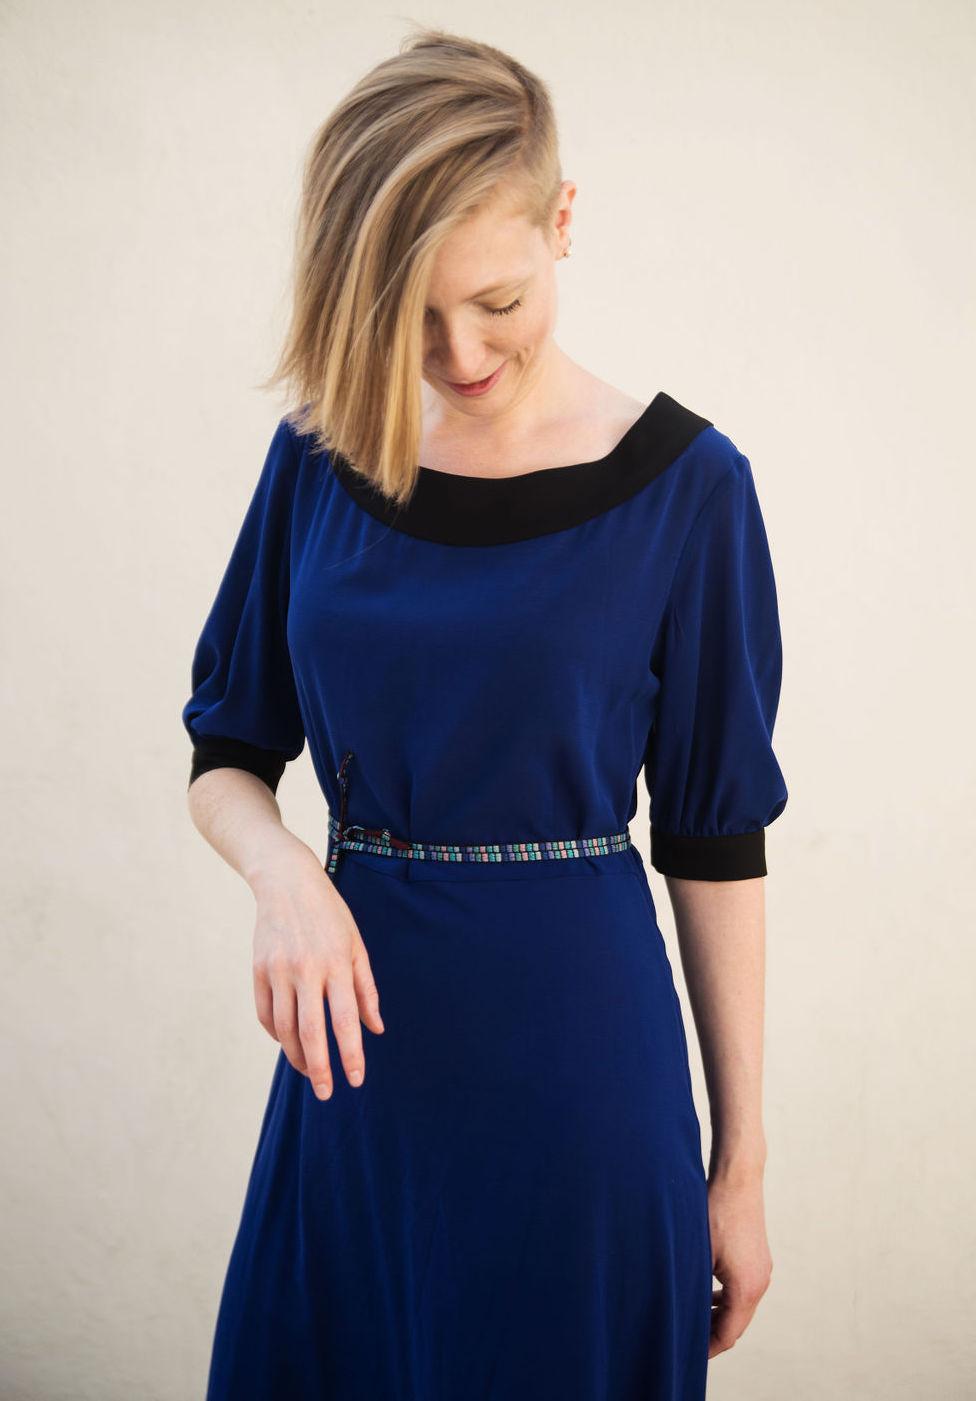 Silk Midi Dress in Cobalt Blue & Black